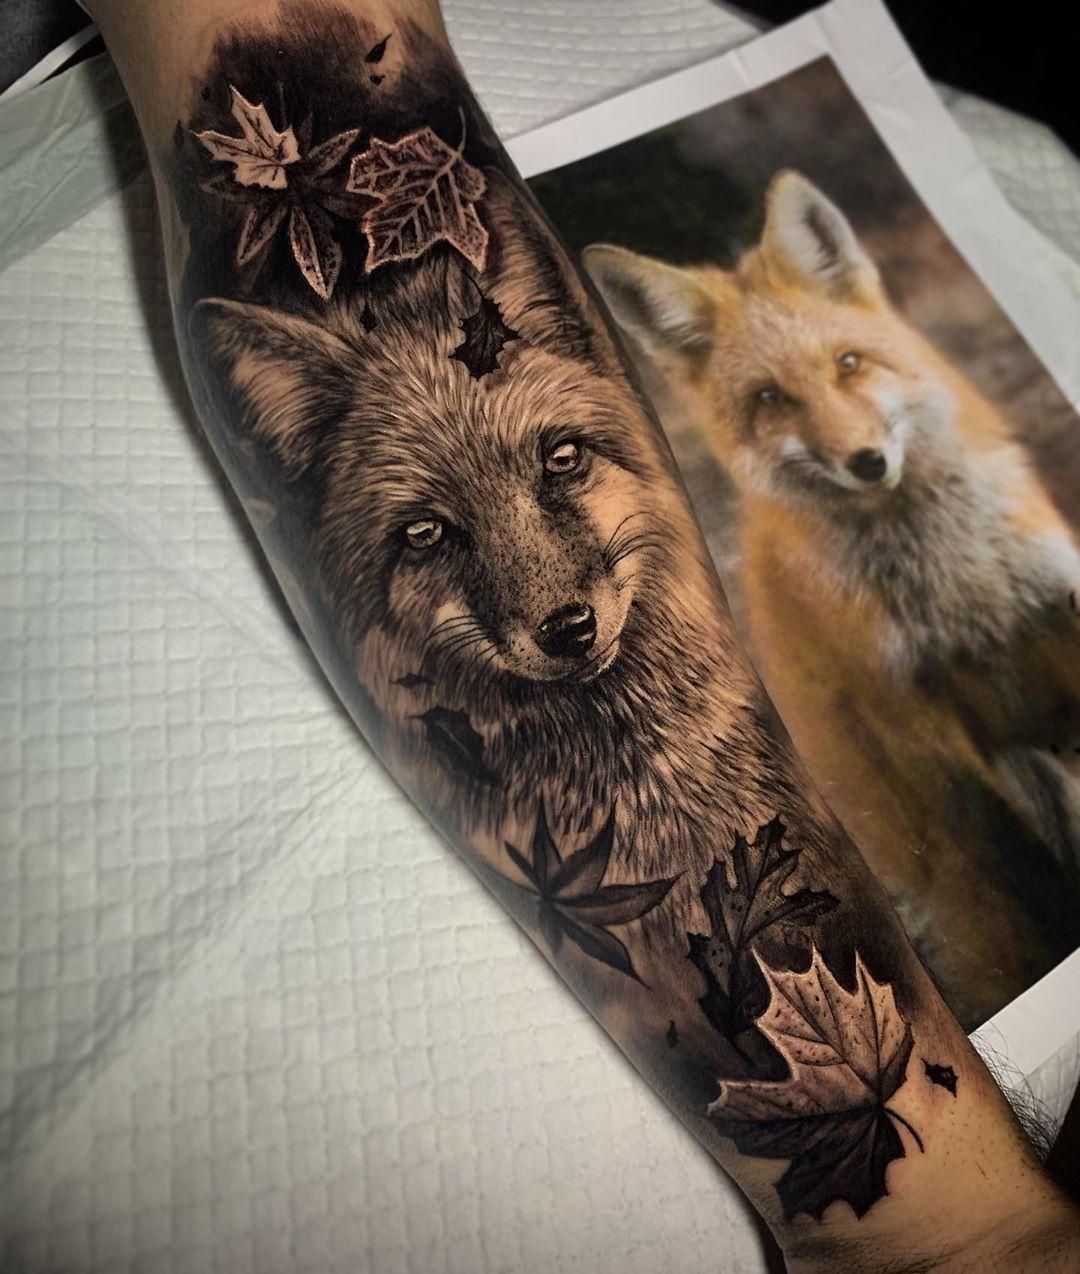 Dylan Weber Tattoo Artist Animal Sleeve Tattoo Red Fox Tattoos Dragon Sleeve Tattoos